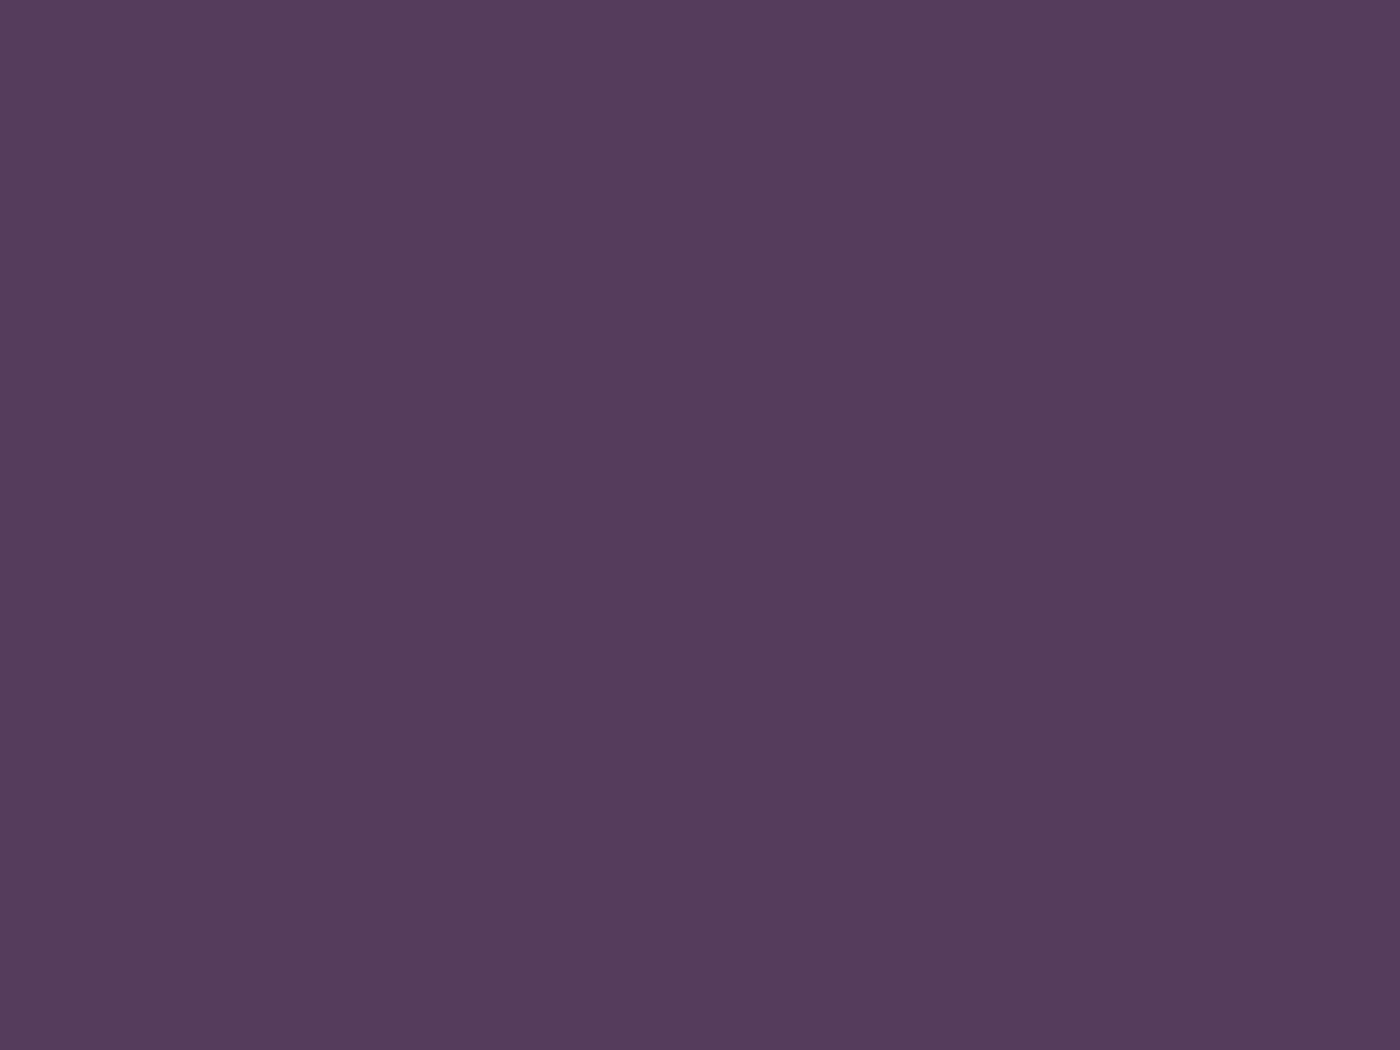 1400x1050 English Violet Solid Color Background